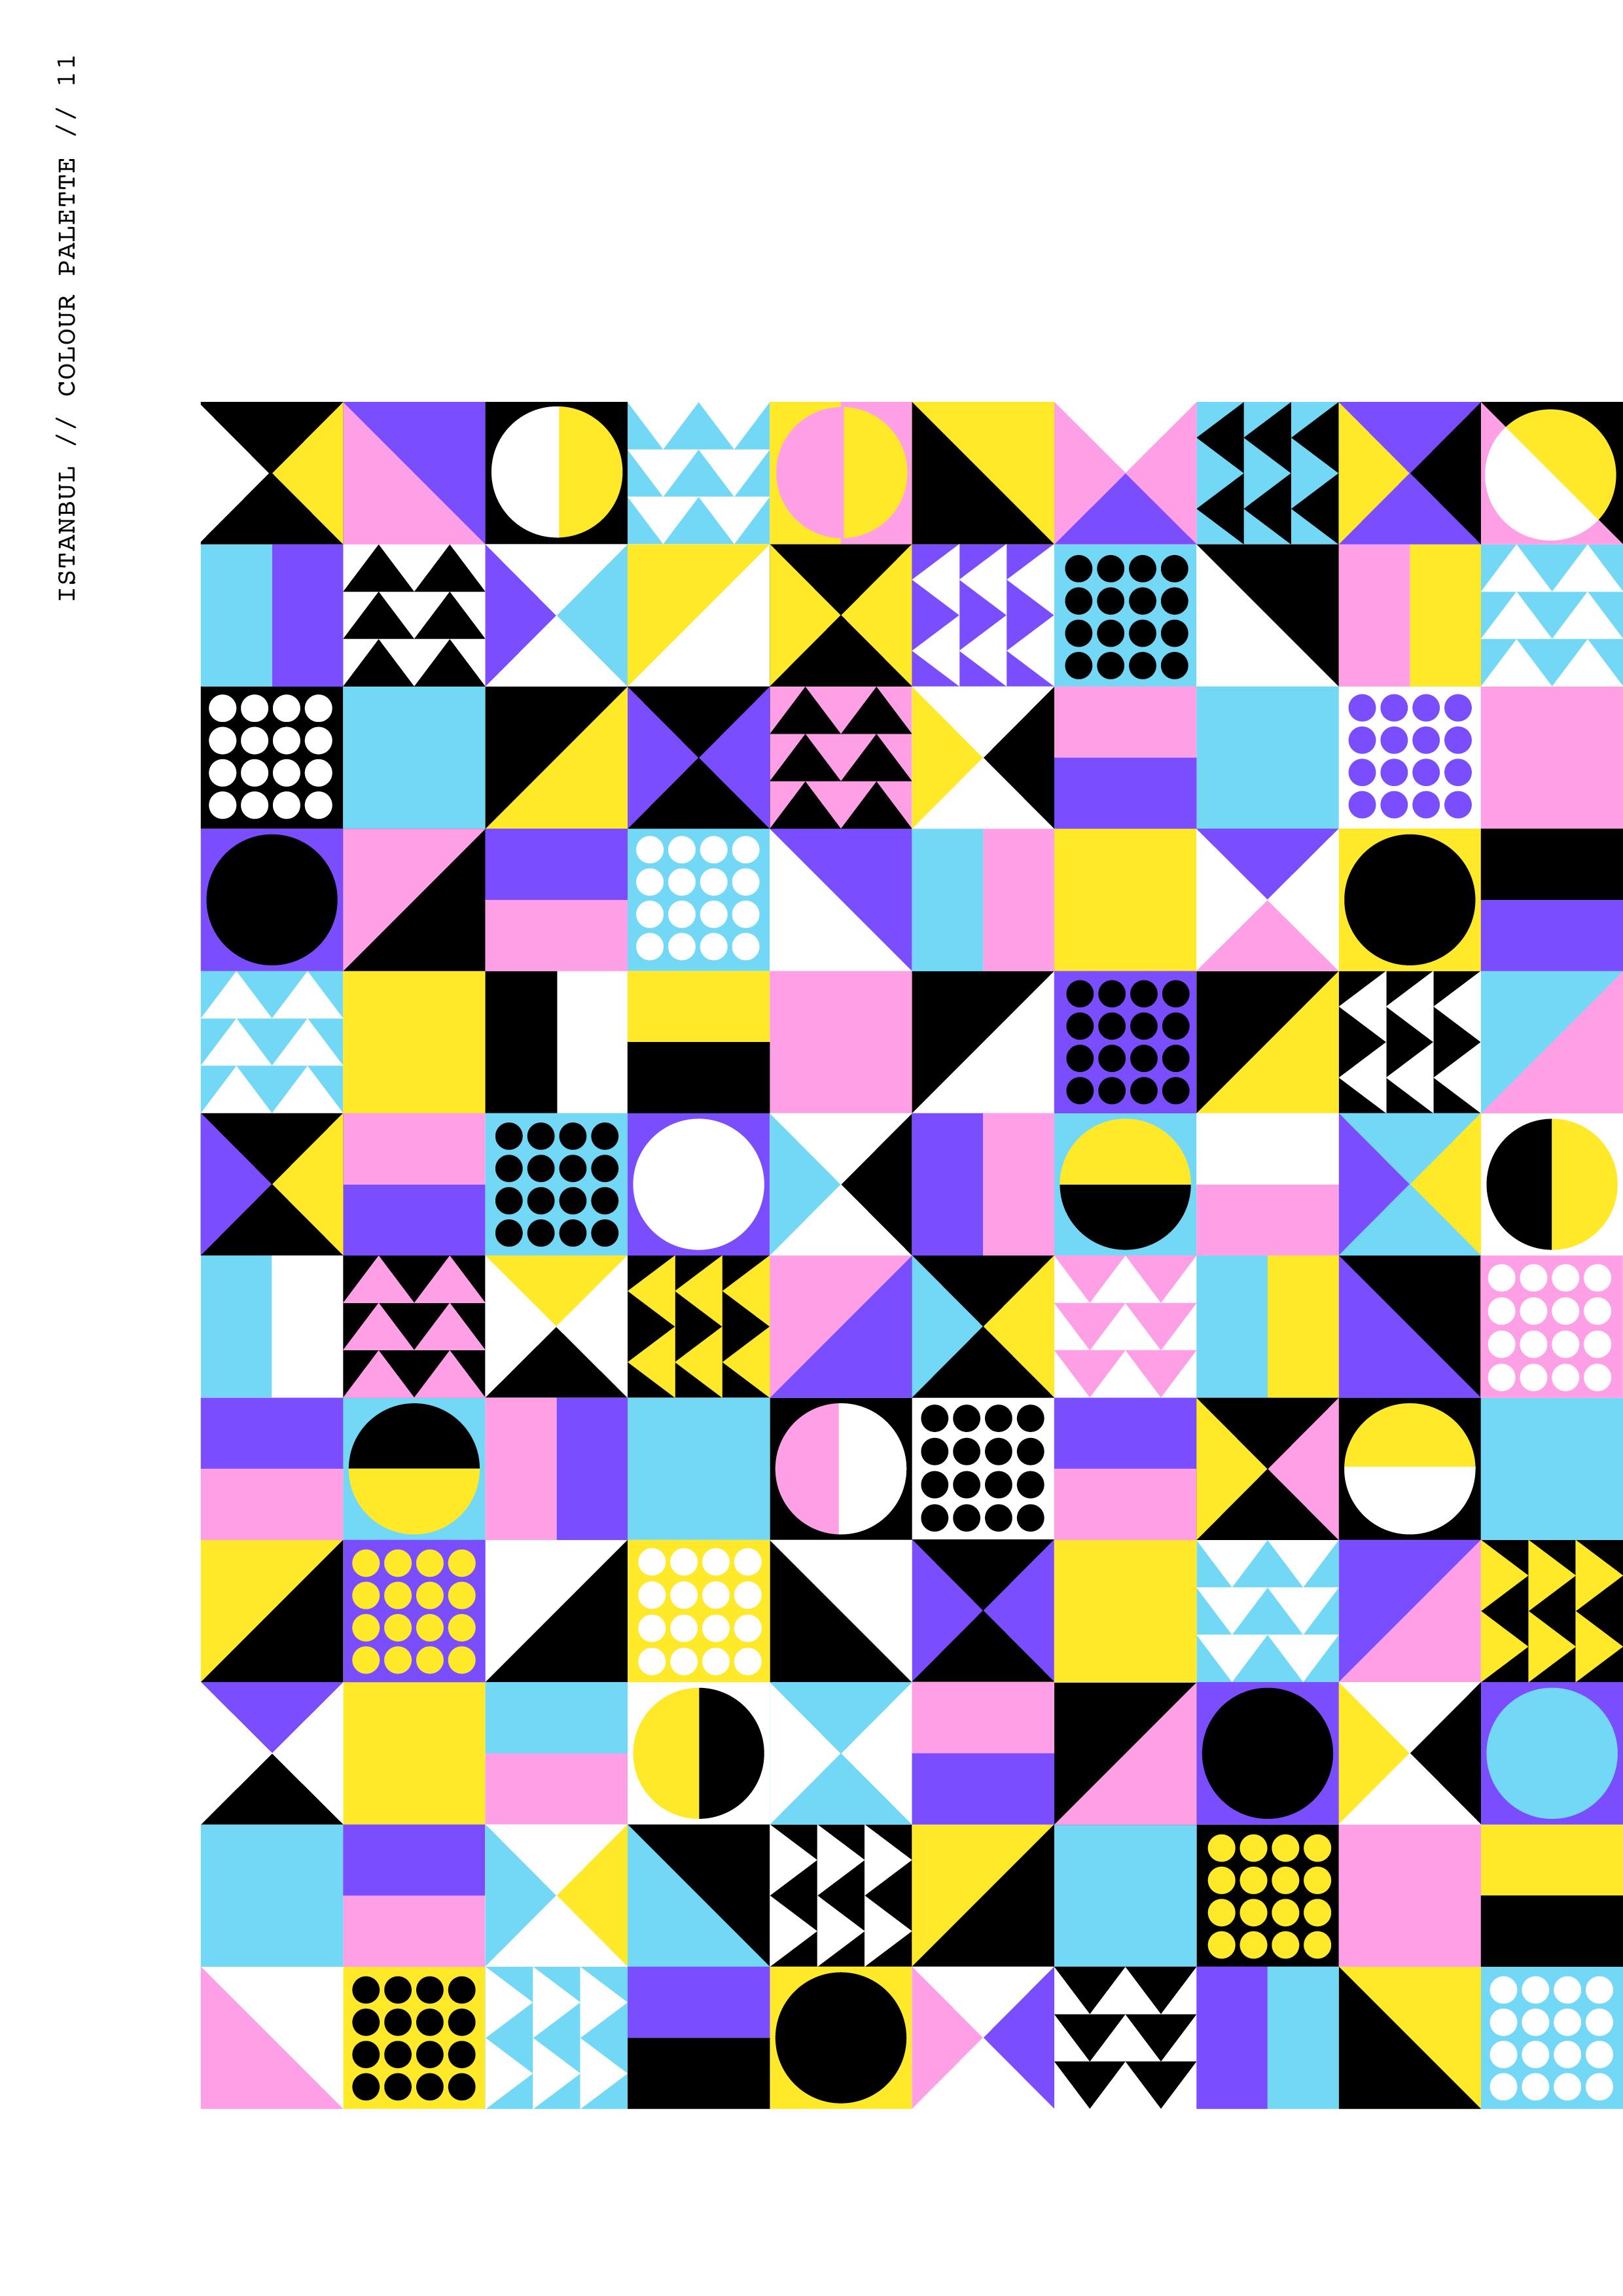 Shanti-Sparrow-Design-Poster-Inspiration